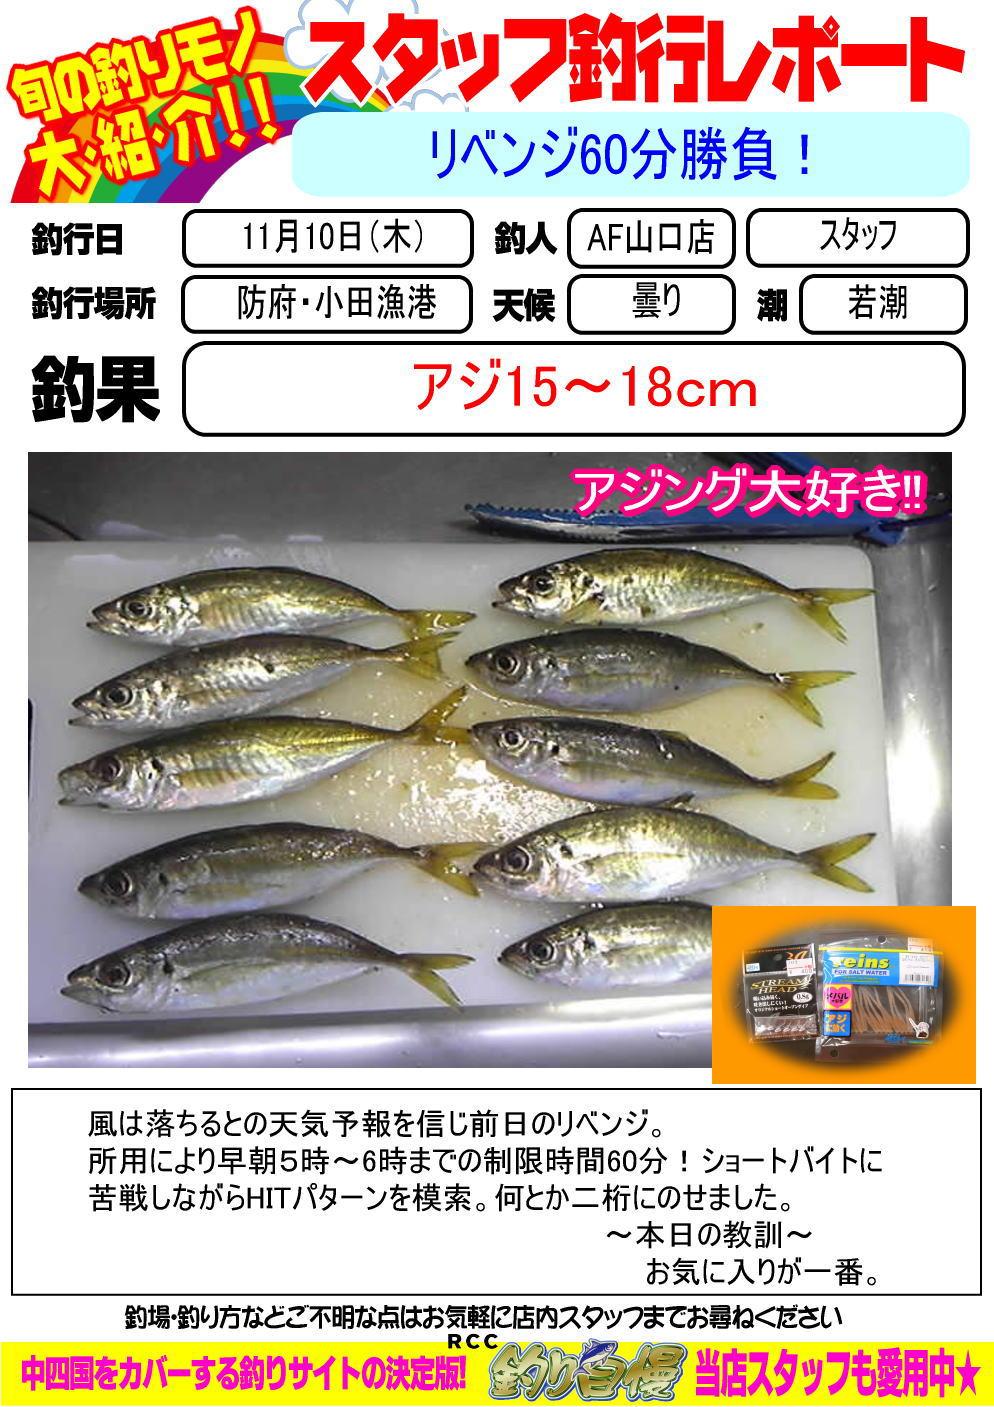 http://www.e-angle.co.jp/shop/blog/blog-20161110-yamaguchi-ajing.jpg